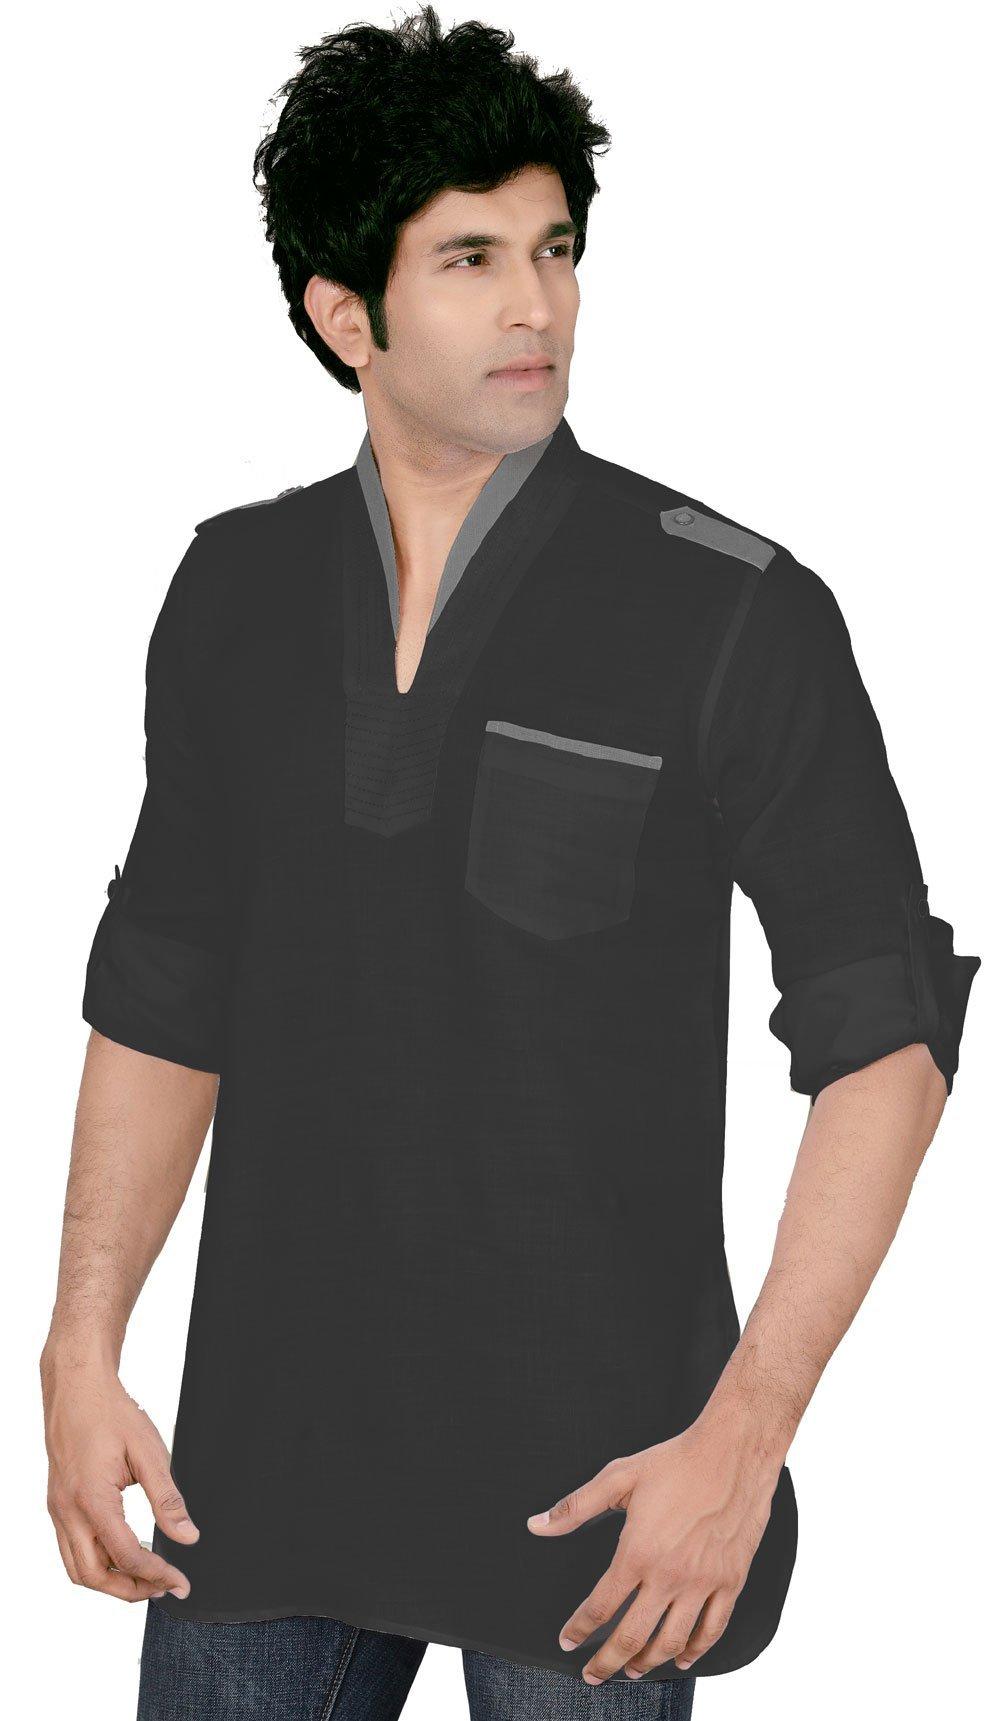 Linen Cotton Dresse Mens Short Kurta Shirt India Fashion Clothing (Black, M)